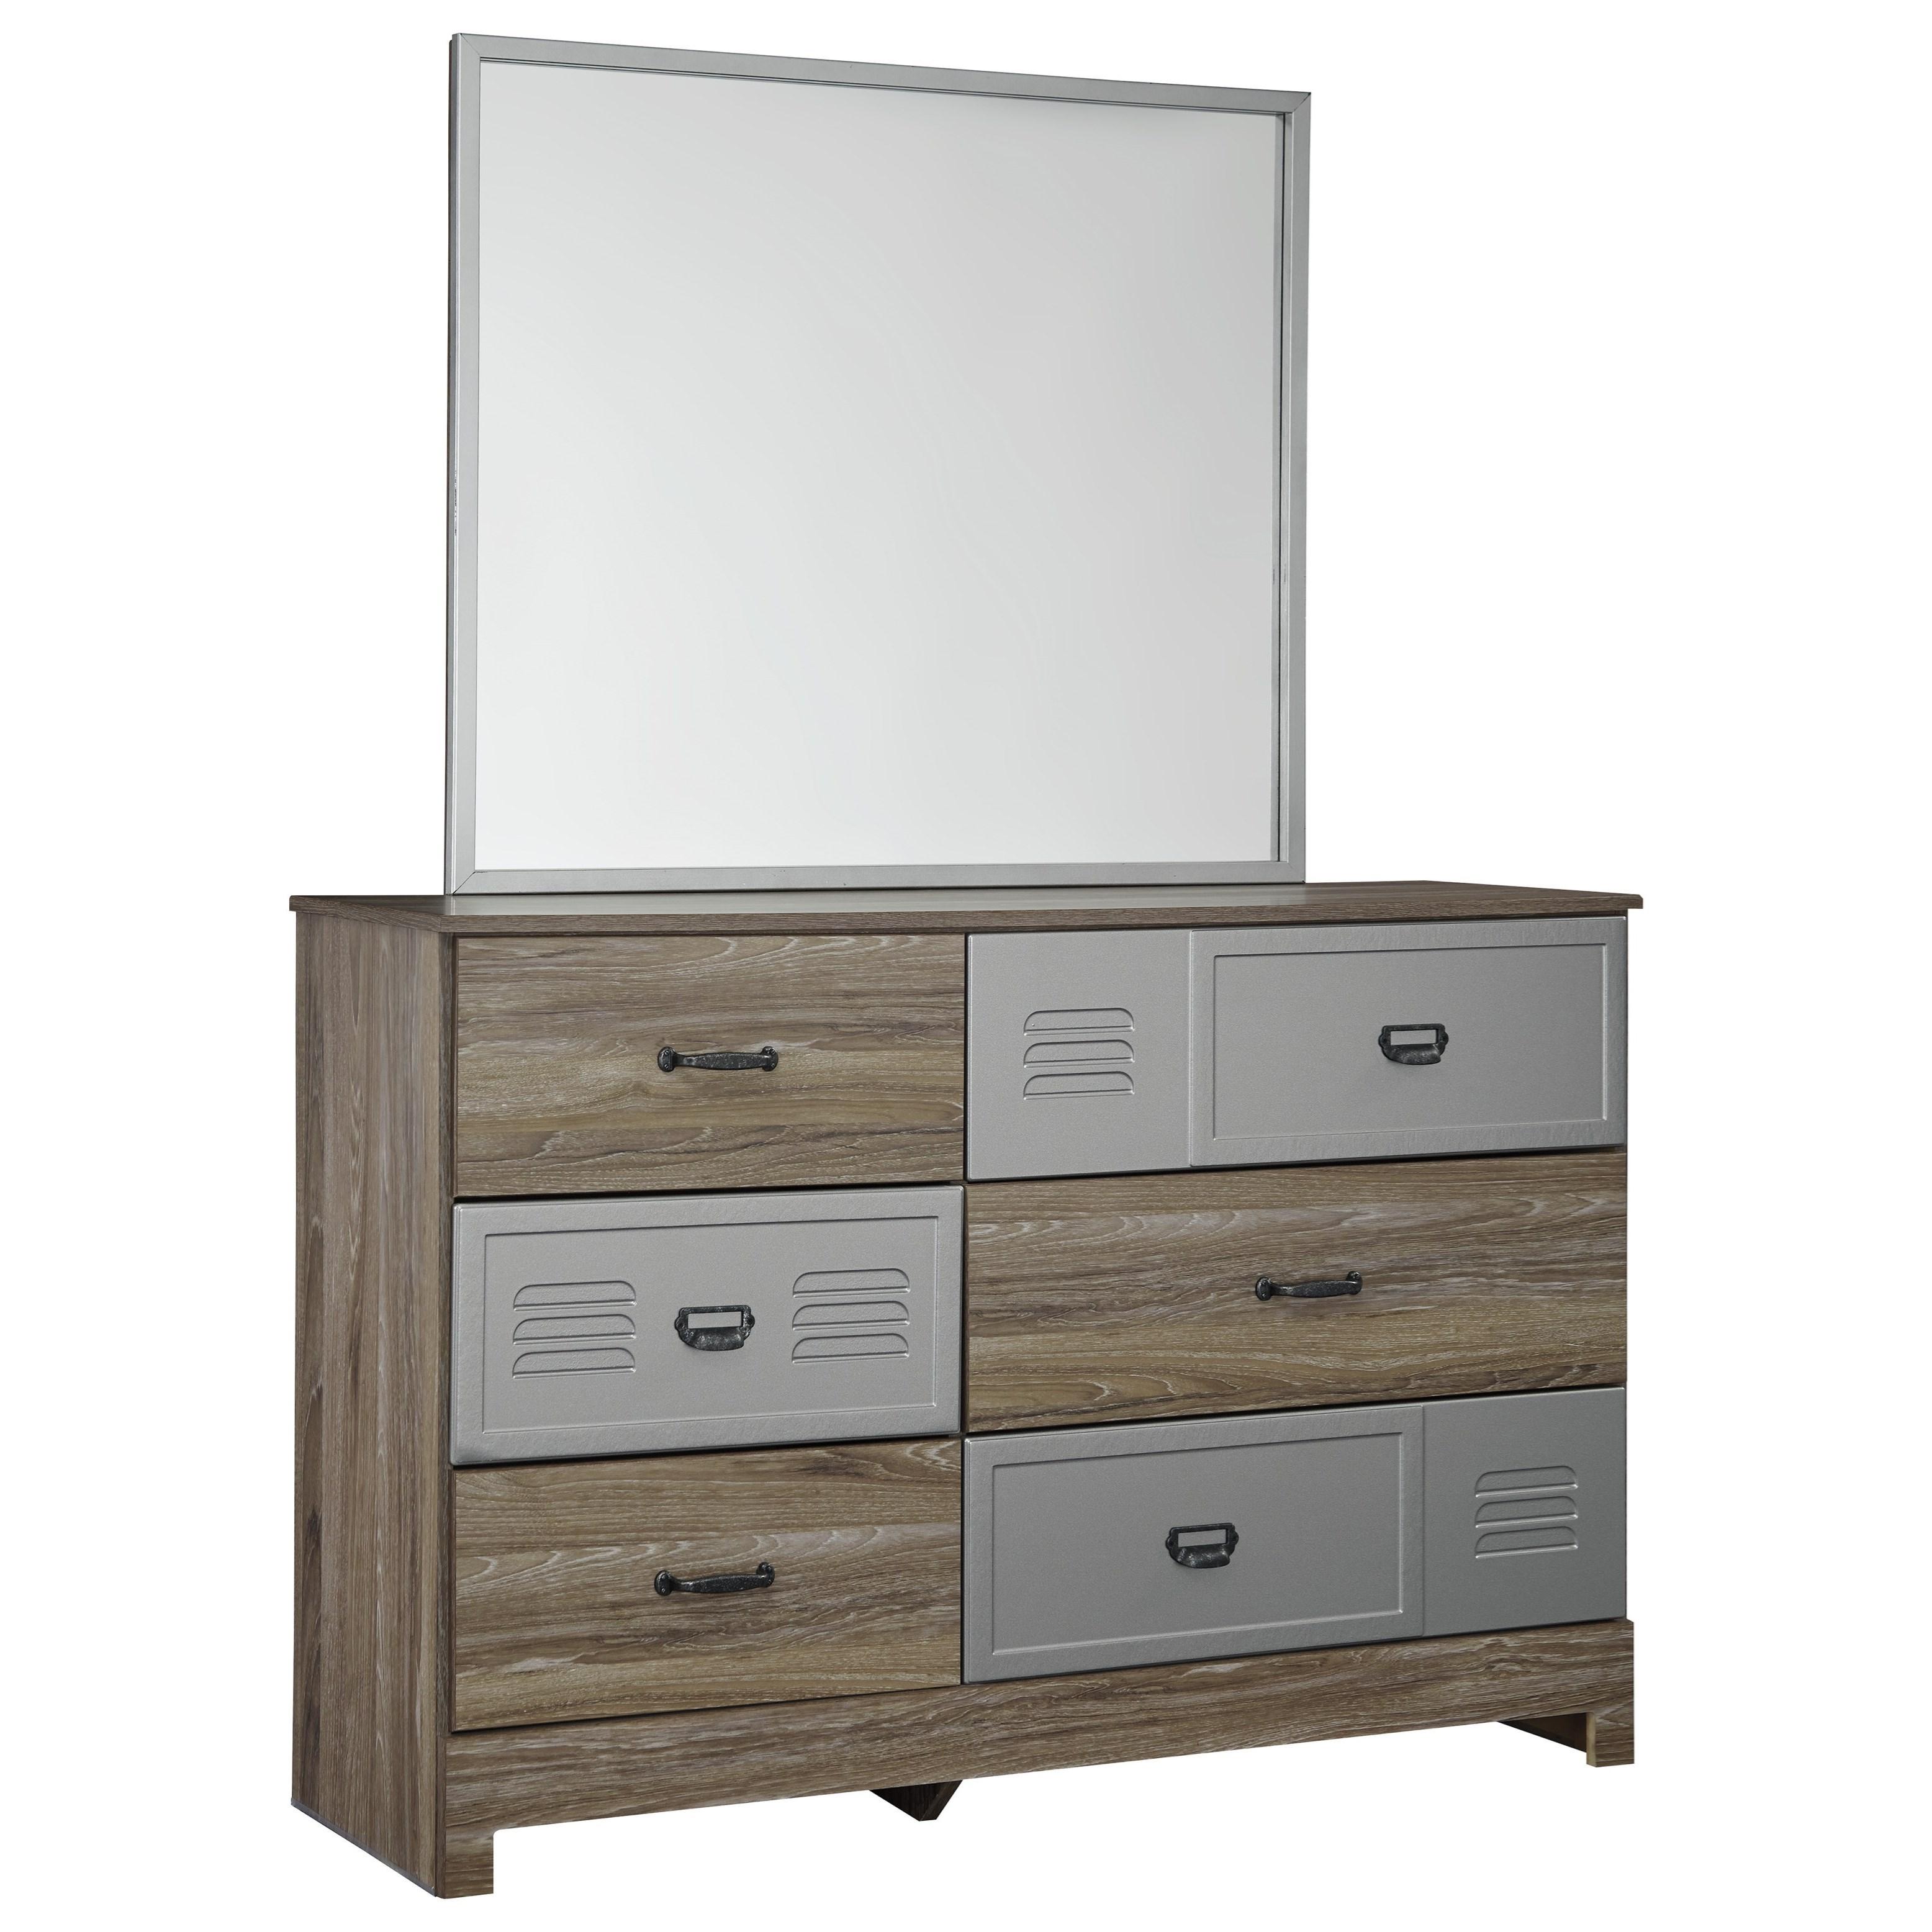 Benchcraft McKeeth Dresser & Bedroom Mirror - Item Number: B099-21+26